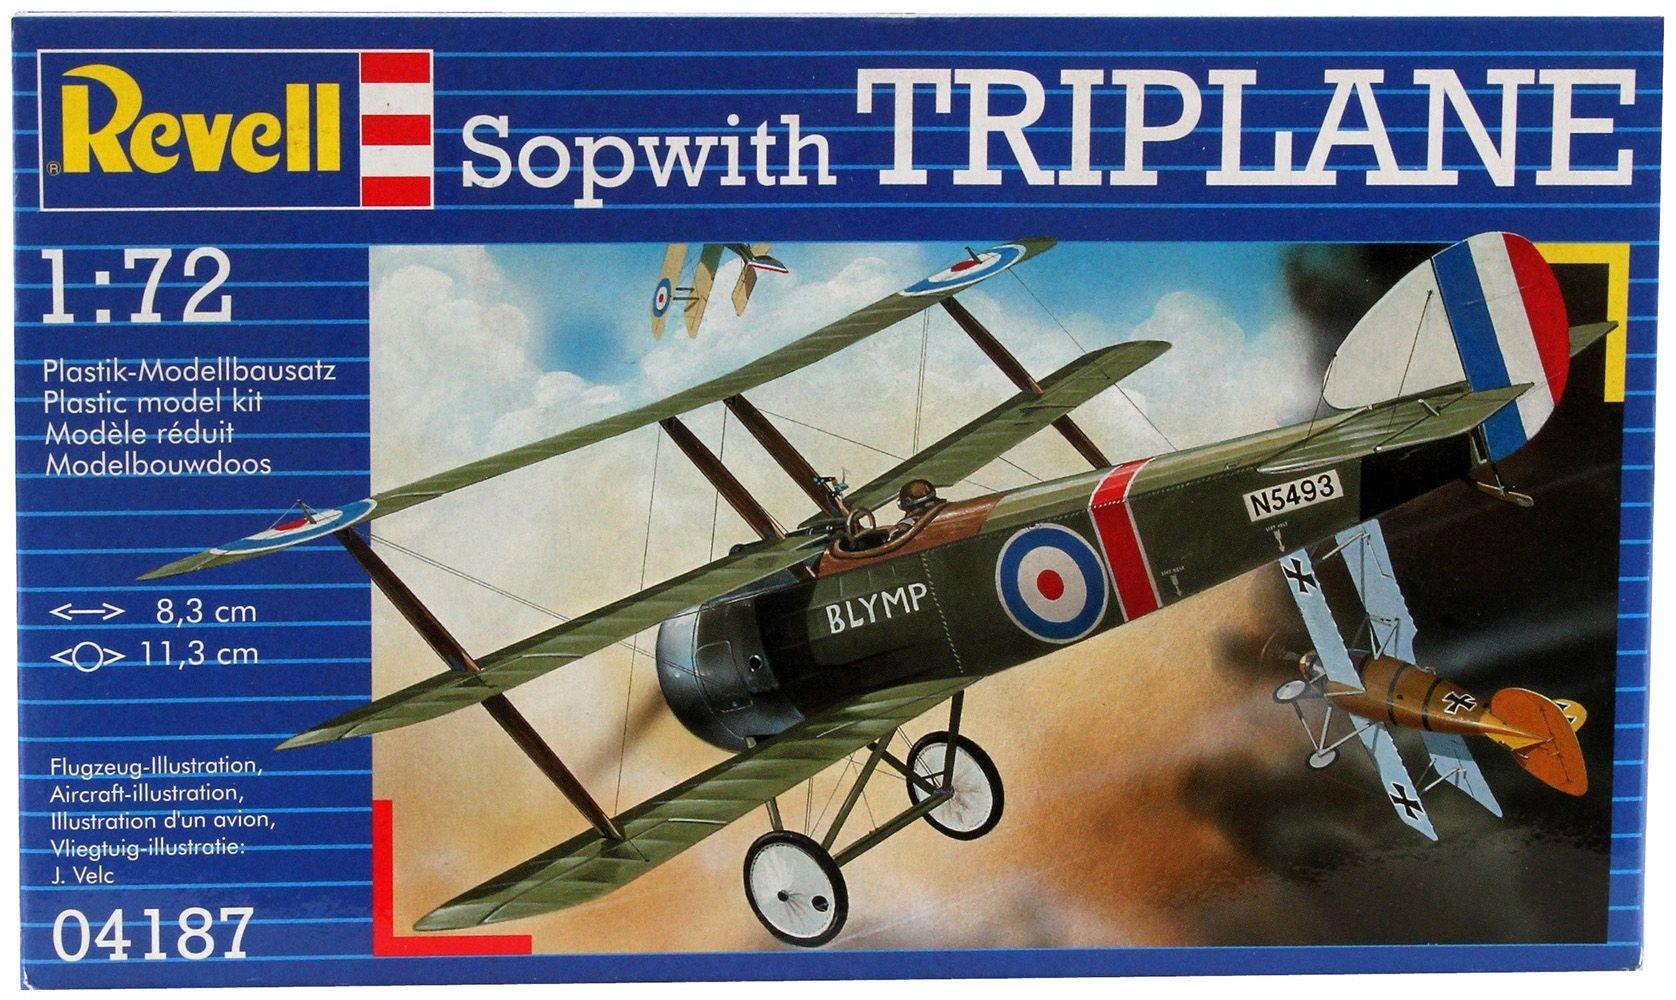 Сглобяем модел на военен самолет Revell - Sopwith Triplane (04187) - 6